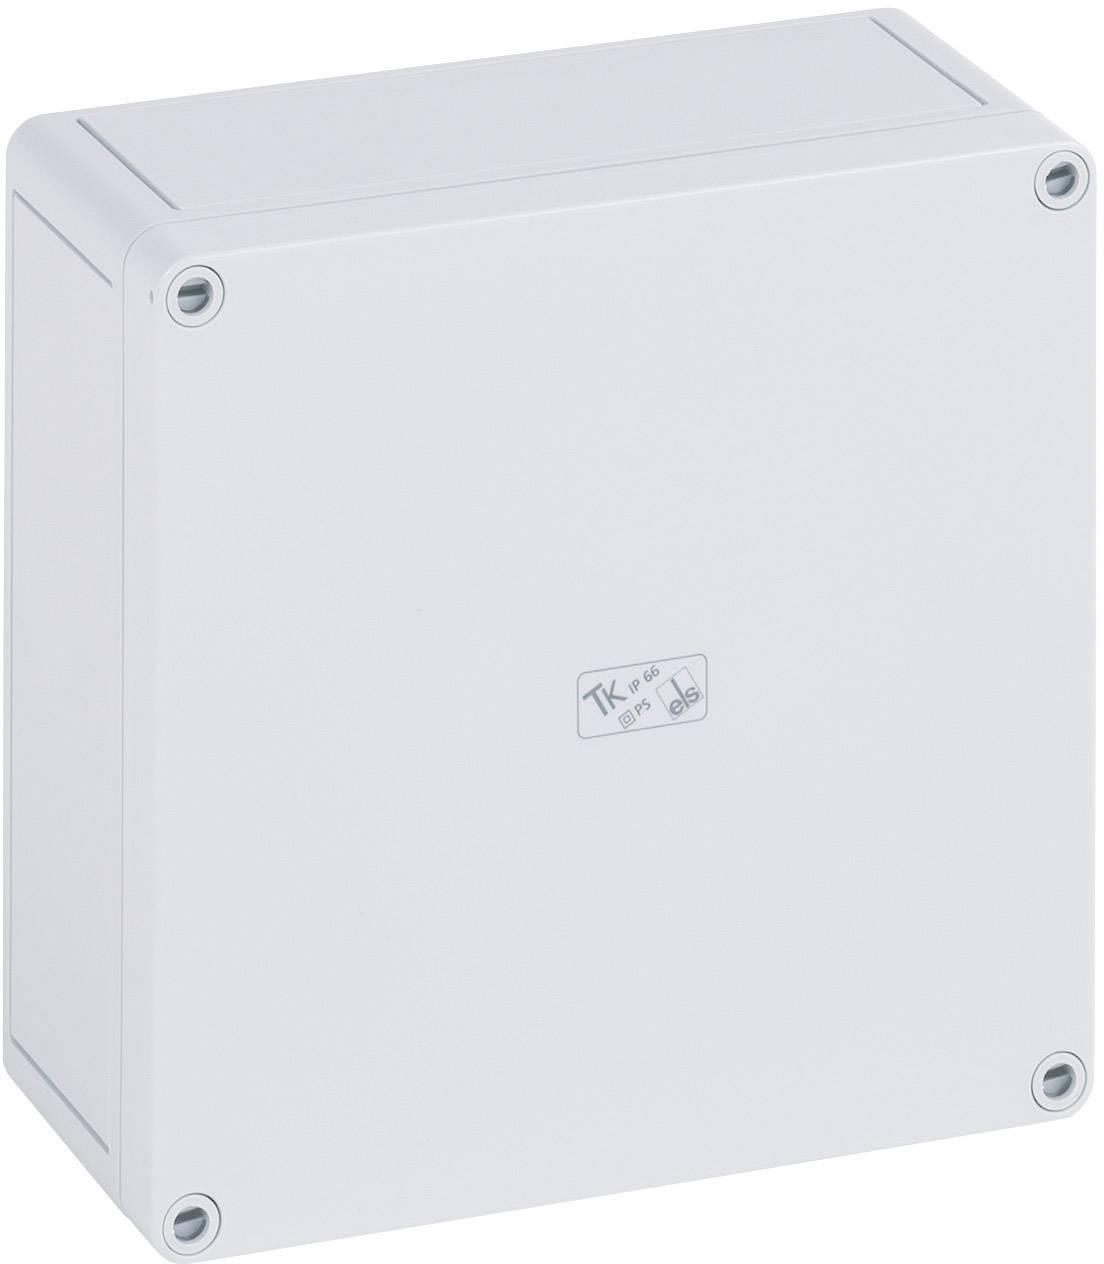 Inštalačná krabička Spelsberg TK PS 1811-9 11040601, (d x š x v) 180 x 110 x 90 mm, polystyrén, svetlo sivá (RAL 7035), 1 ks